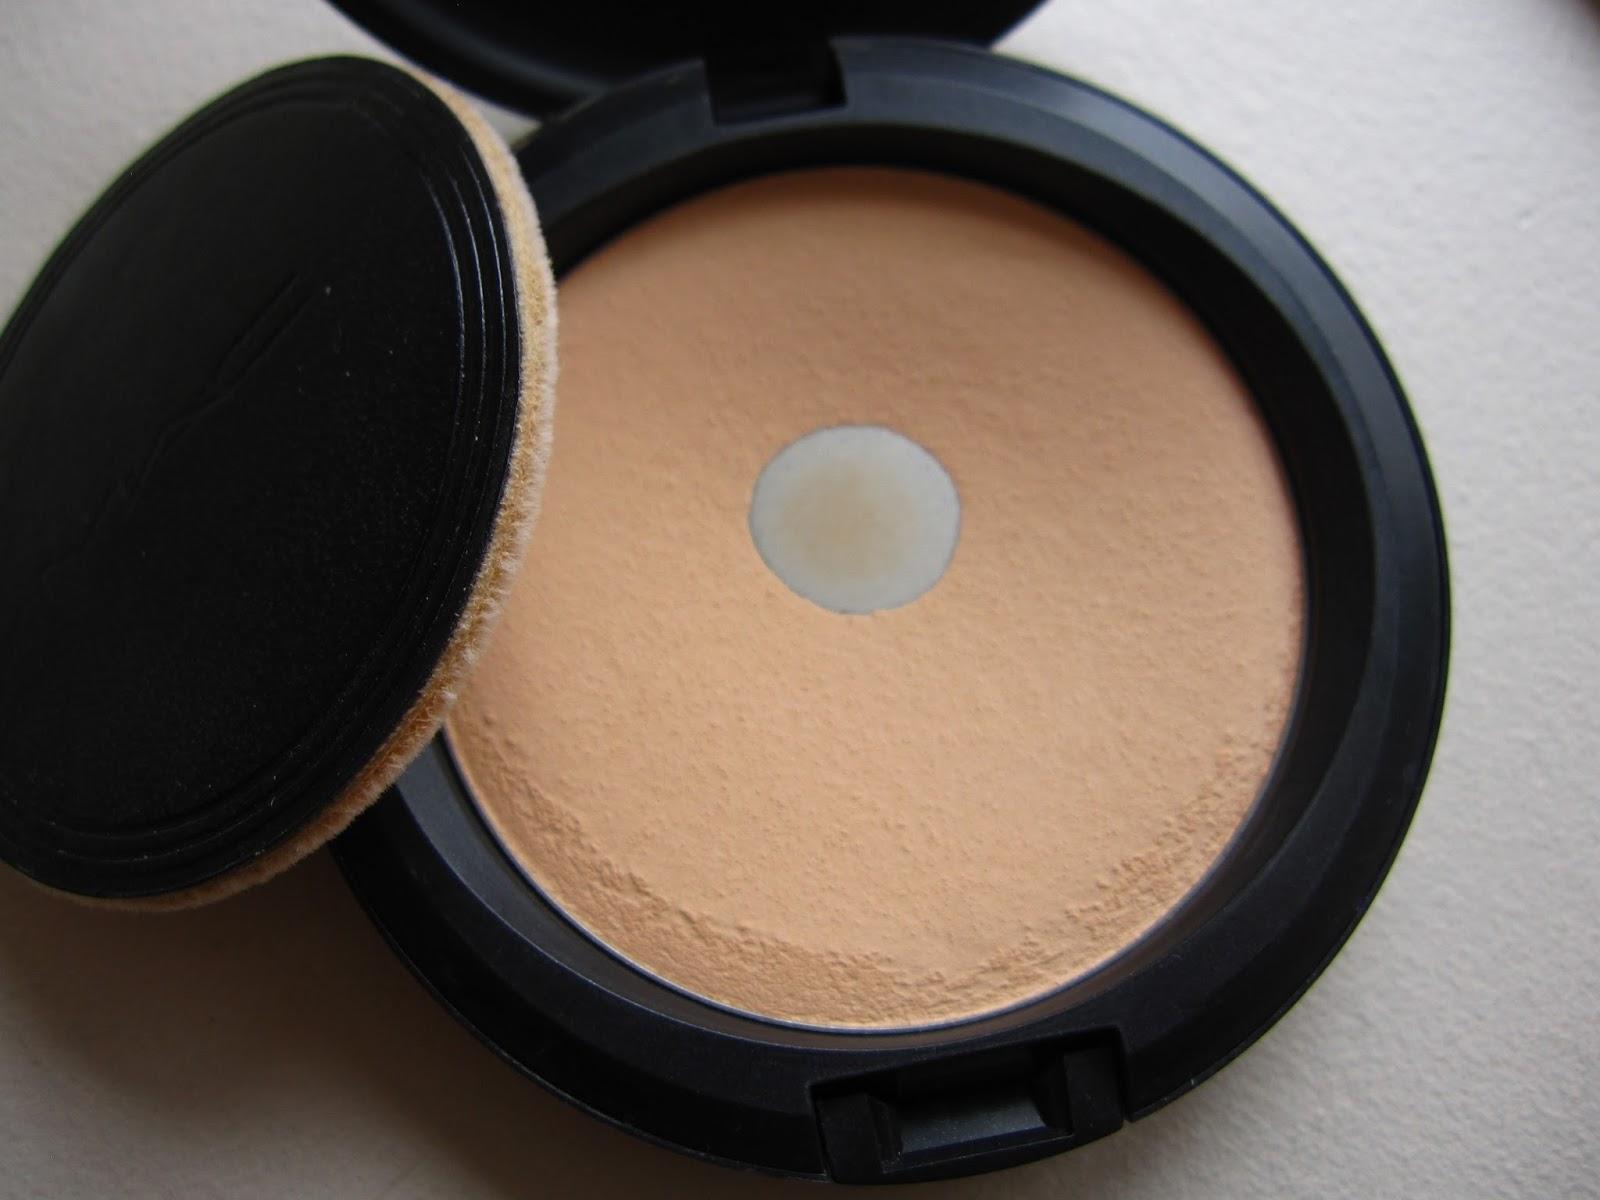 MAC studio careblend pressed powder review light plus